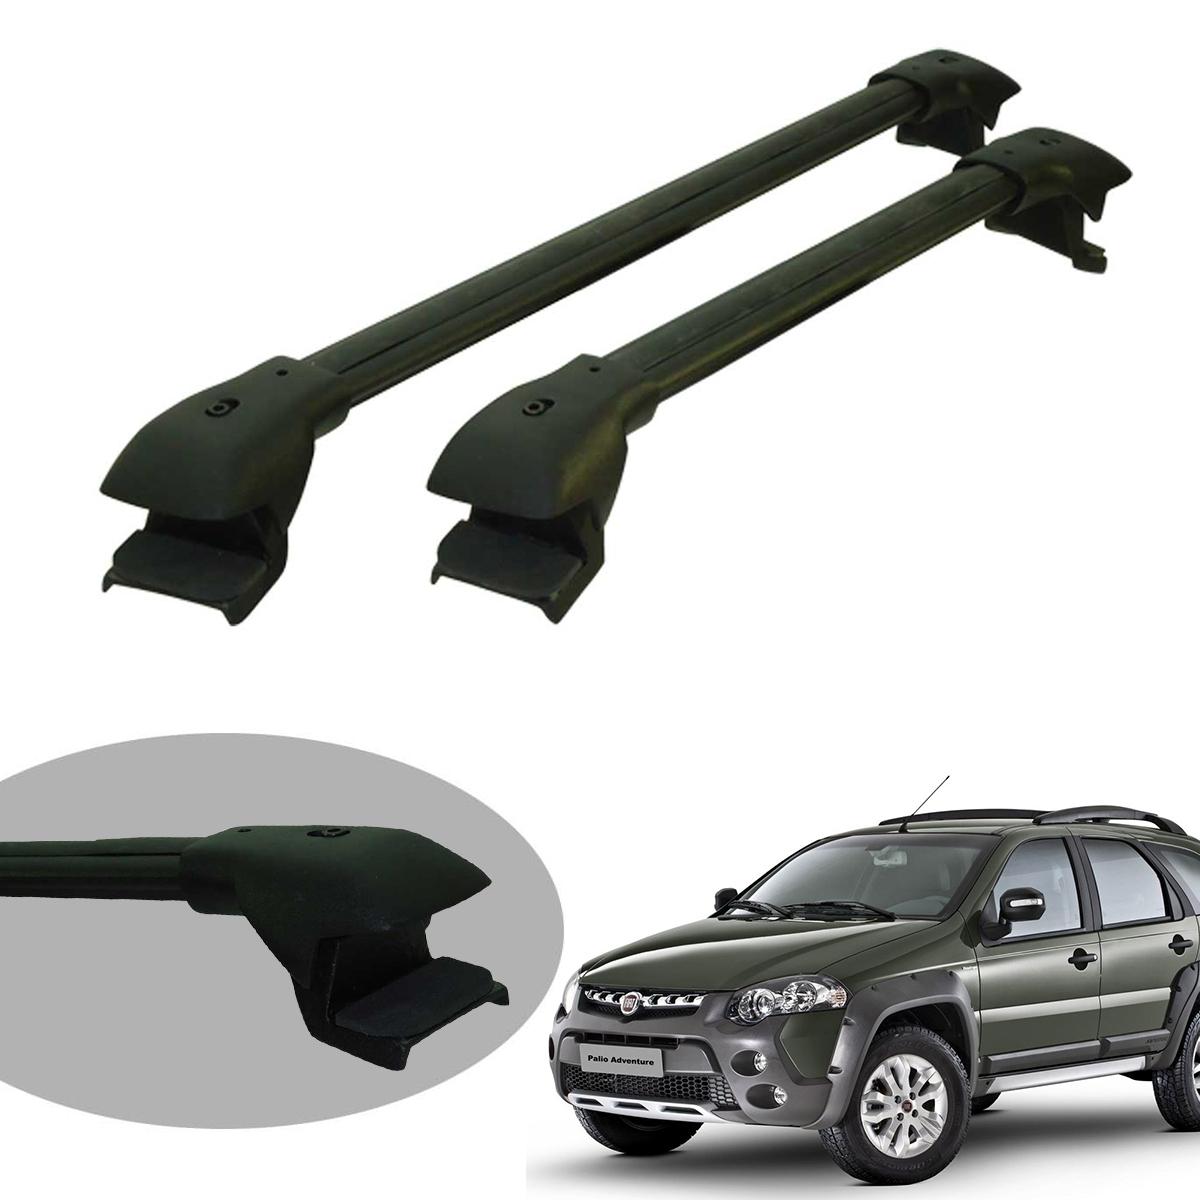 Travessa rack de teto larga preta alumínio Palio Weekend Adventure 2009 a 2012 ou Weekend Adventure 2013 a 2020